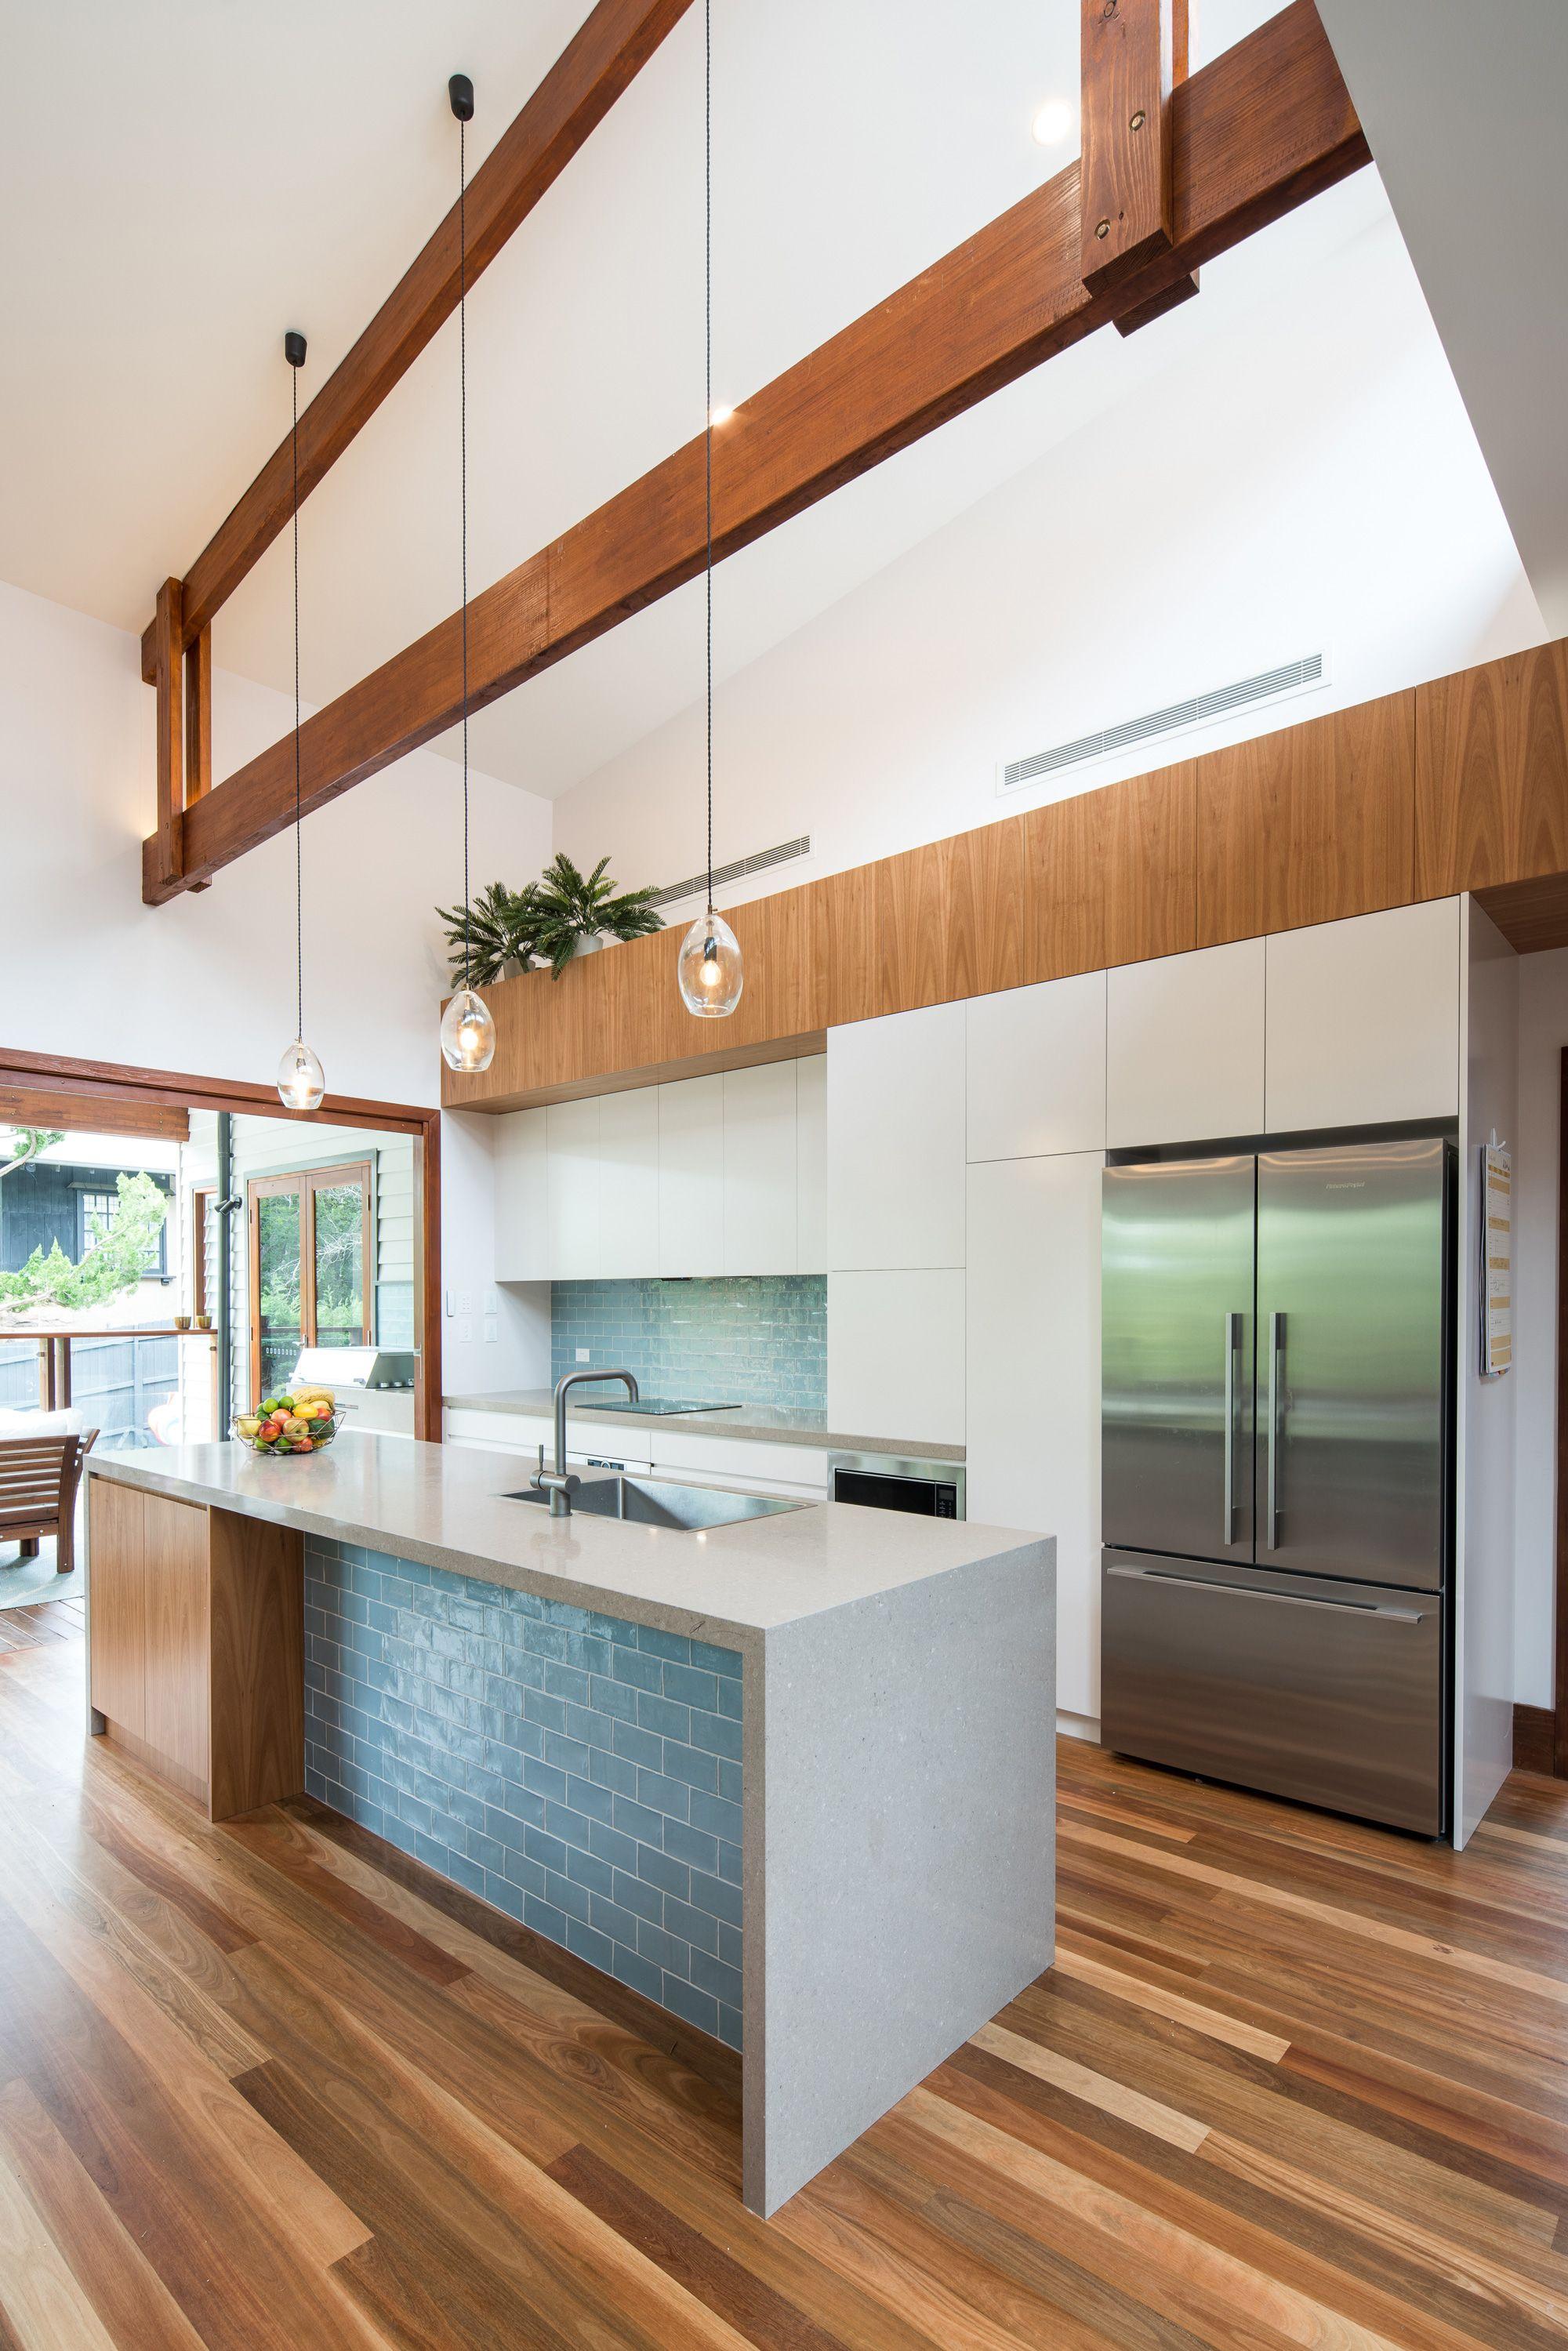 FamilyFriendly Sydney Kitchen Timber kitchen, Kitchen